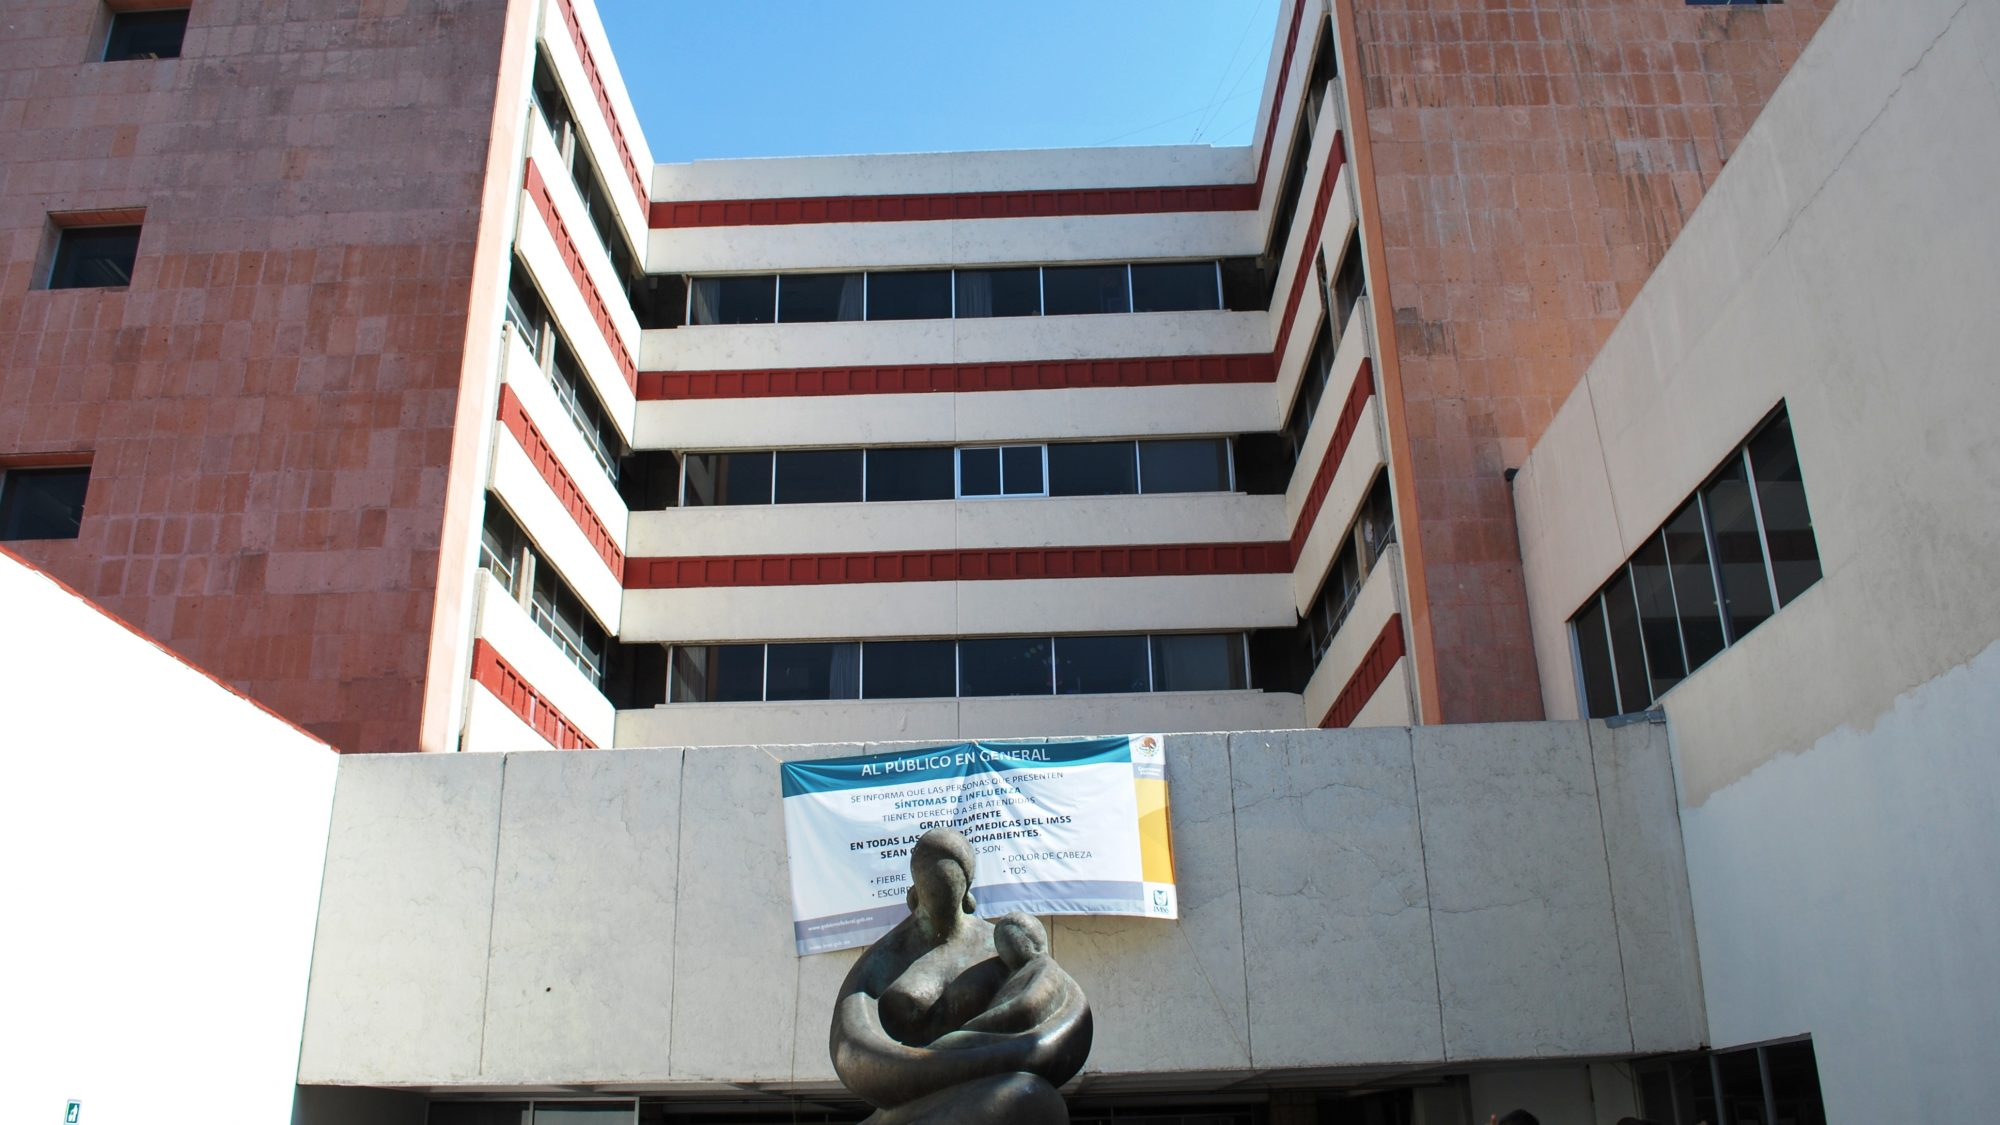 Los Venados public hospital located on Municipio Libre and Dr Vertiz streets in the Benito Juarez borough of Mexico City